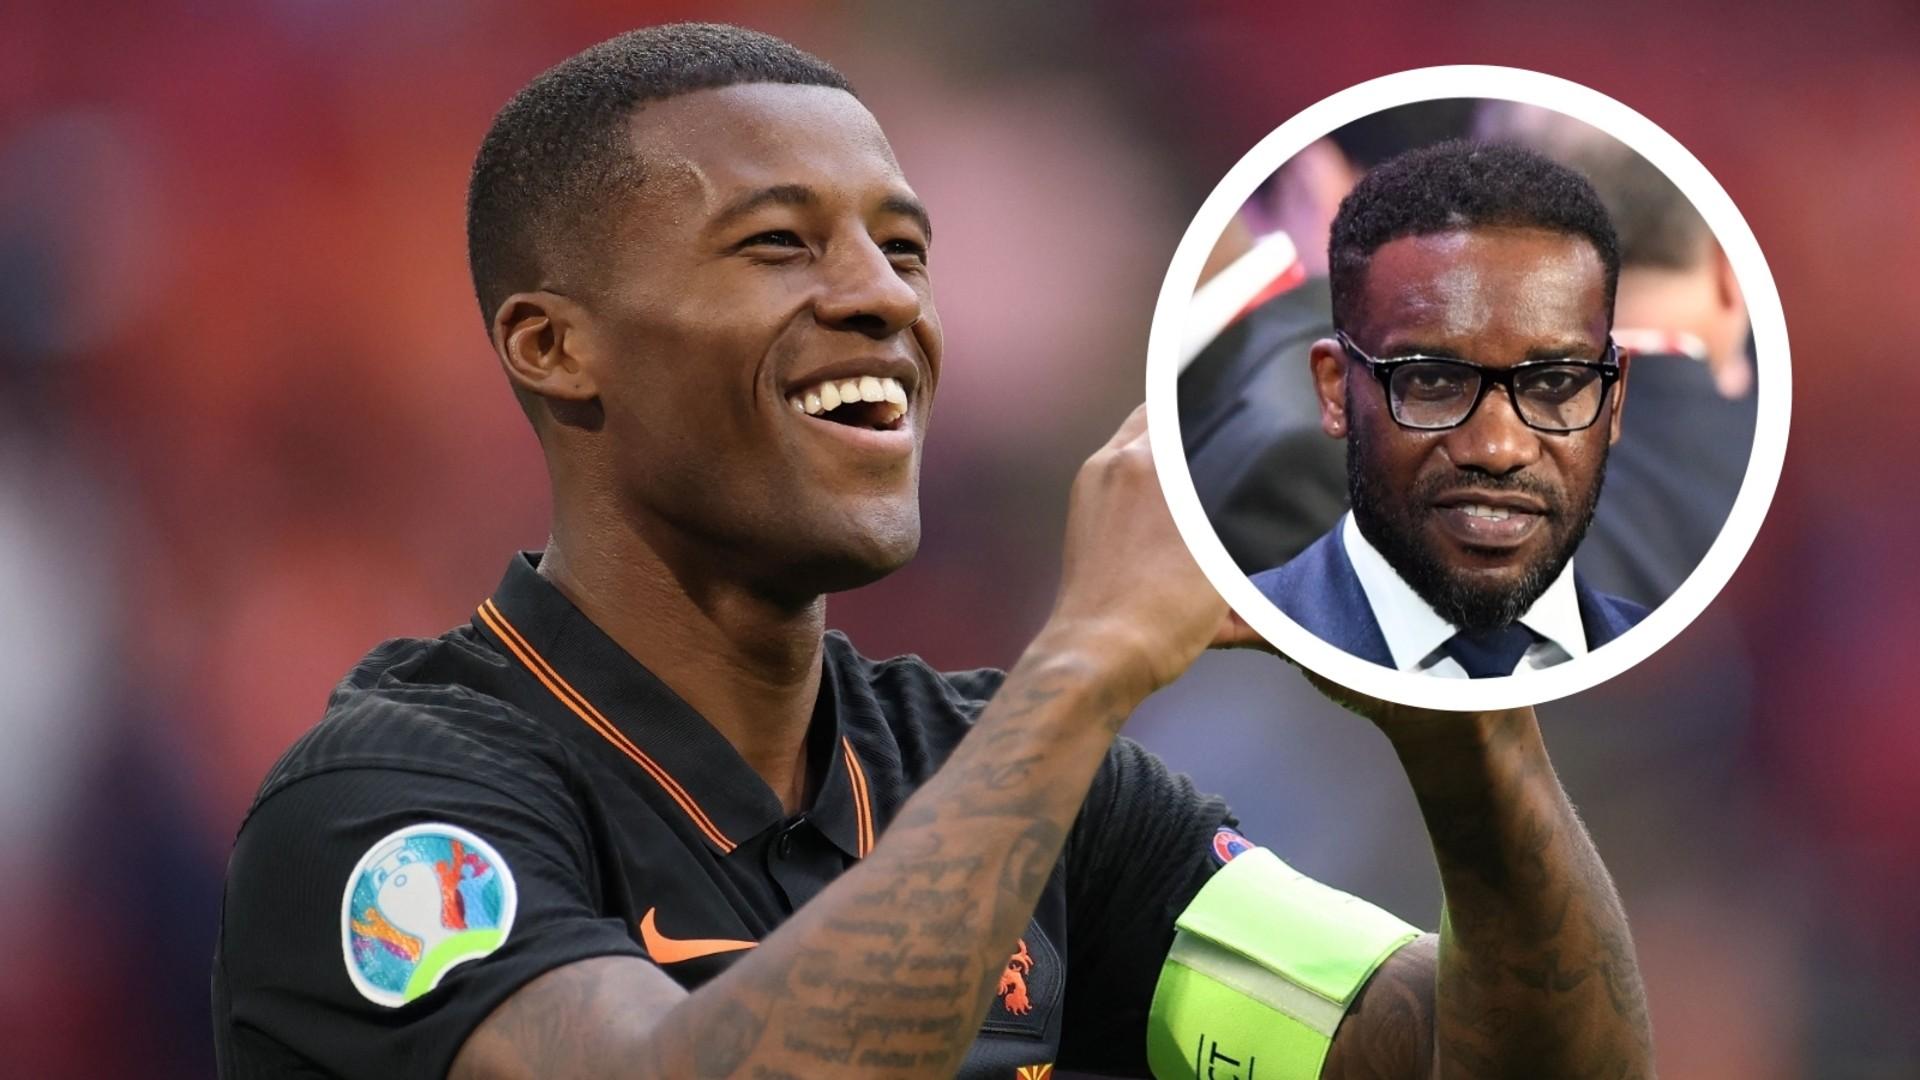 Wijnaldum: 'He's a modern midfielder' – Okocha in awe of North Macedonia-slaying PSG star